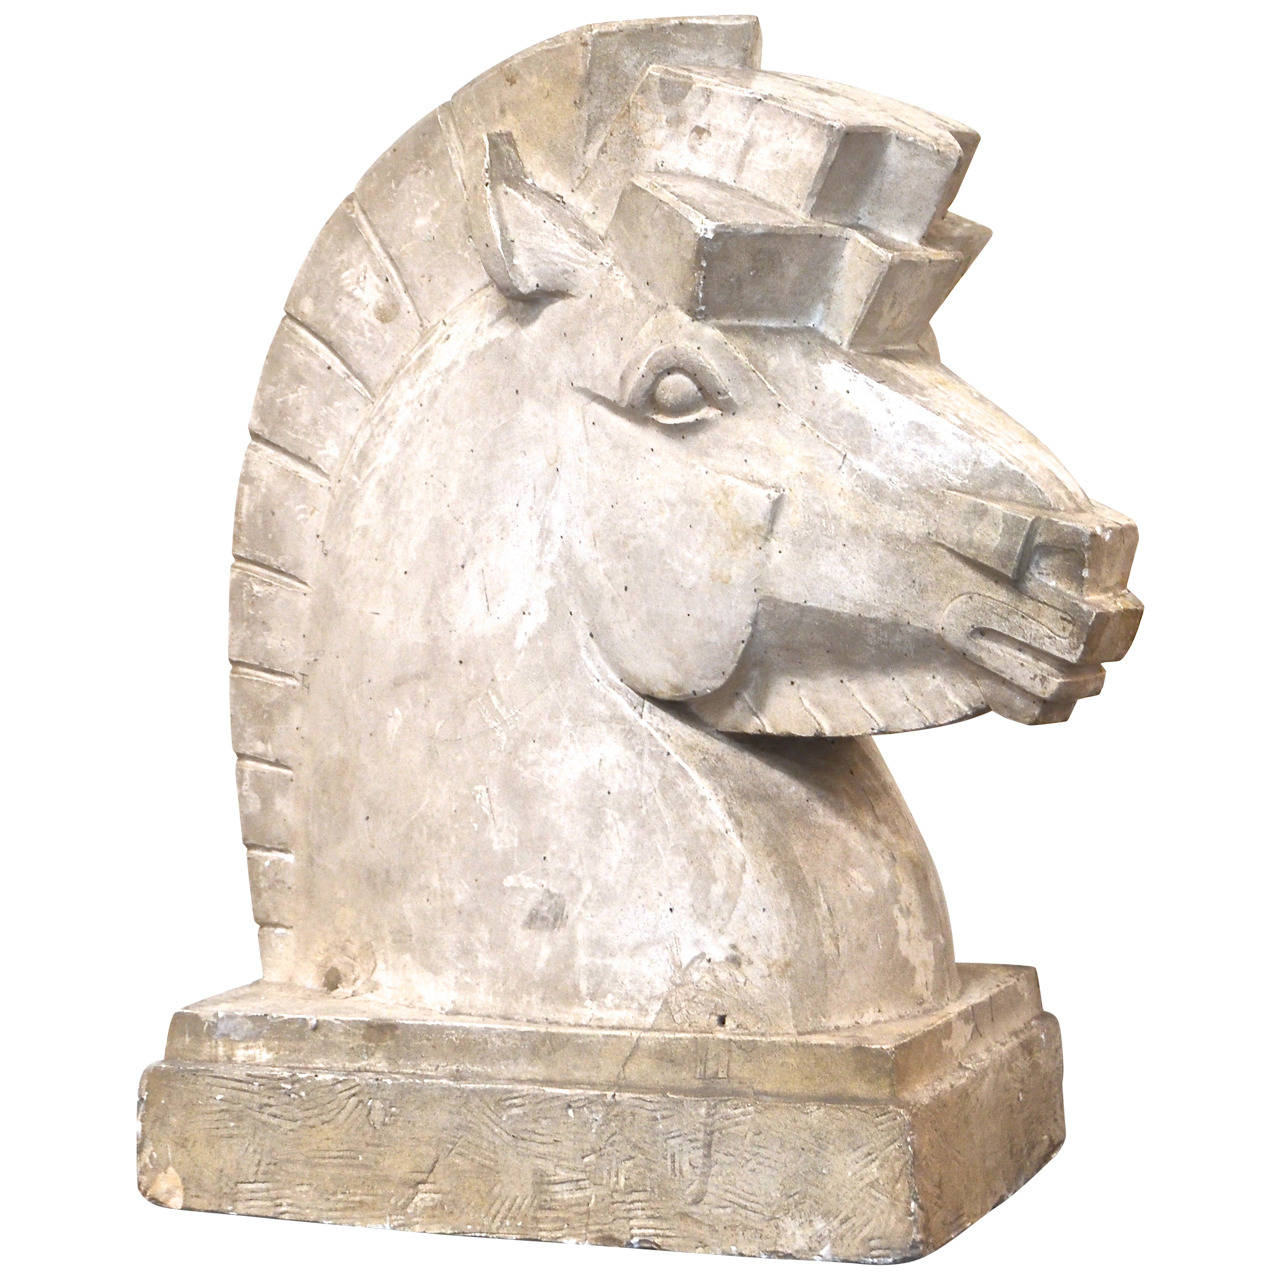 Rosemont Sears  Art Deco Plaster Horse Head Sculpture $9,500